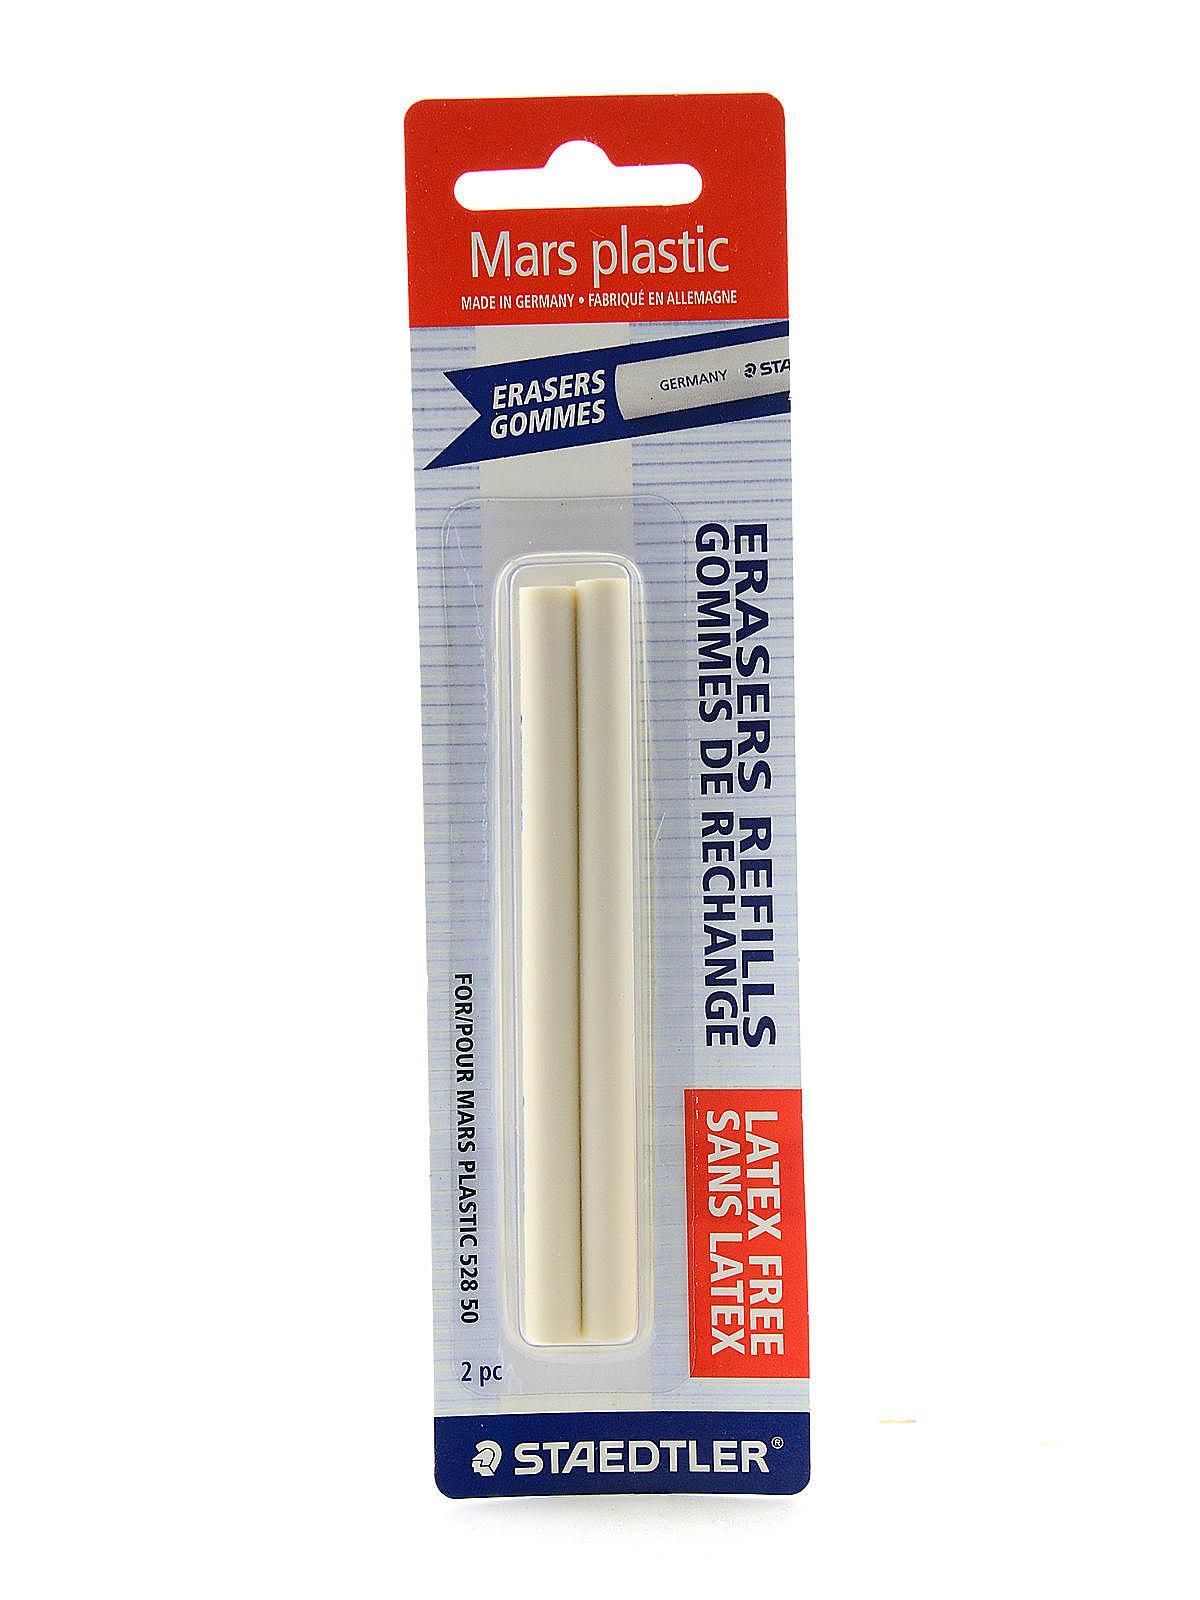 Mars White Plastic Stick Eraser and Refills